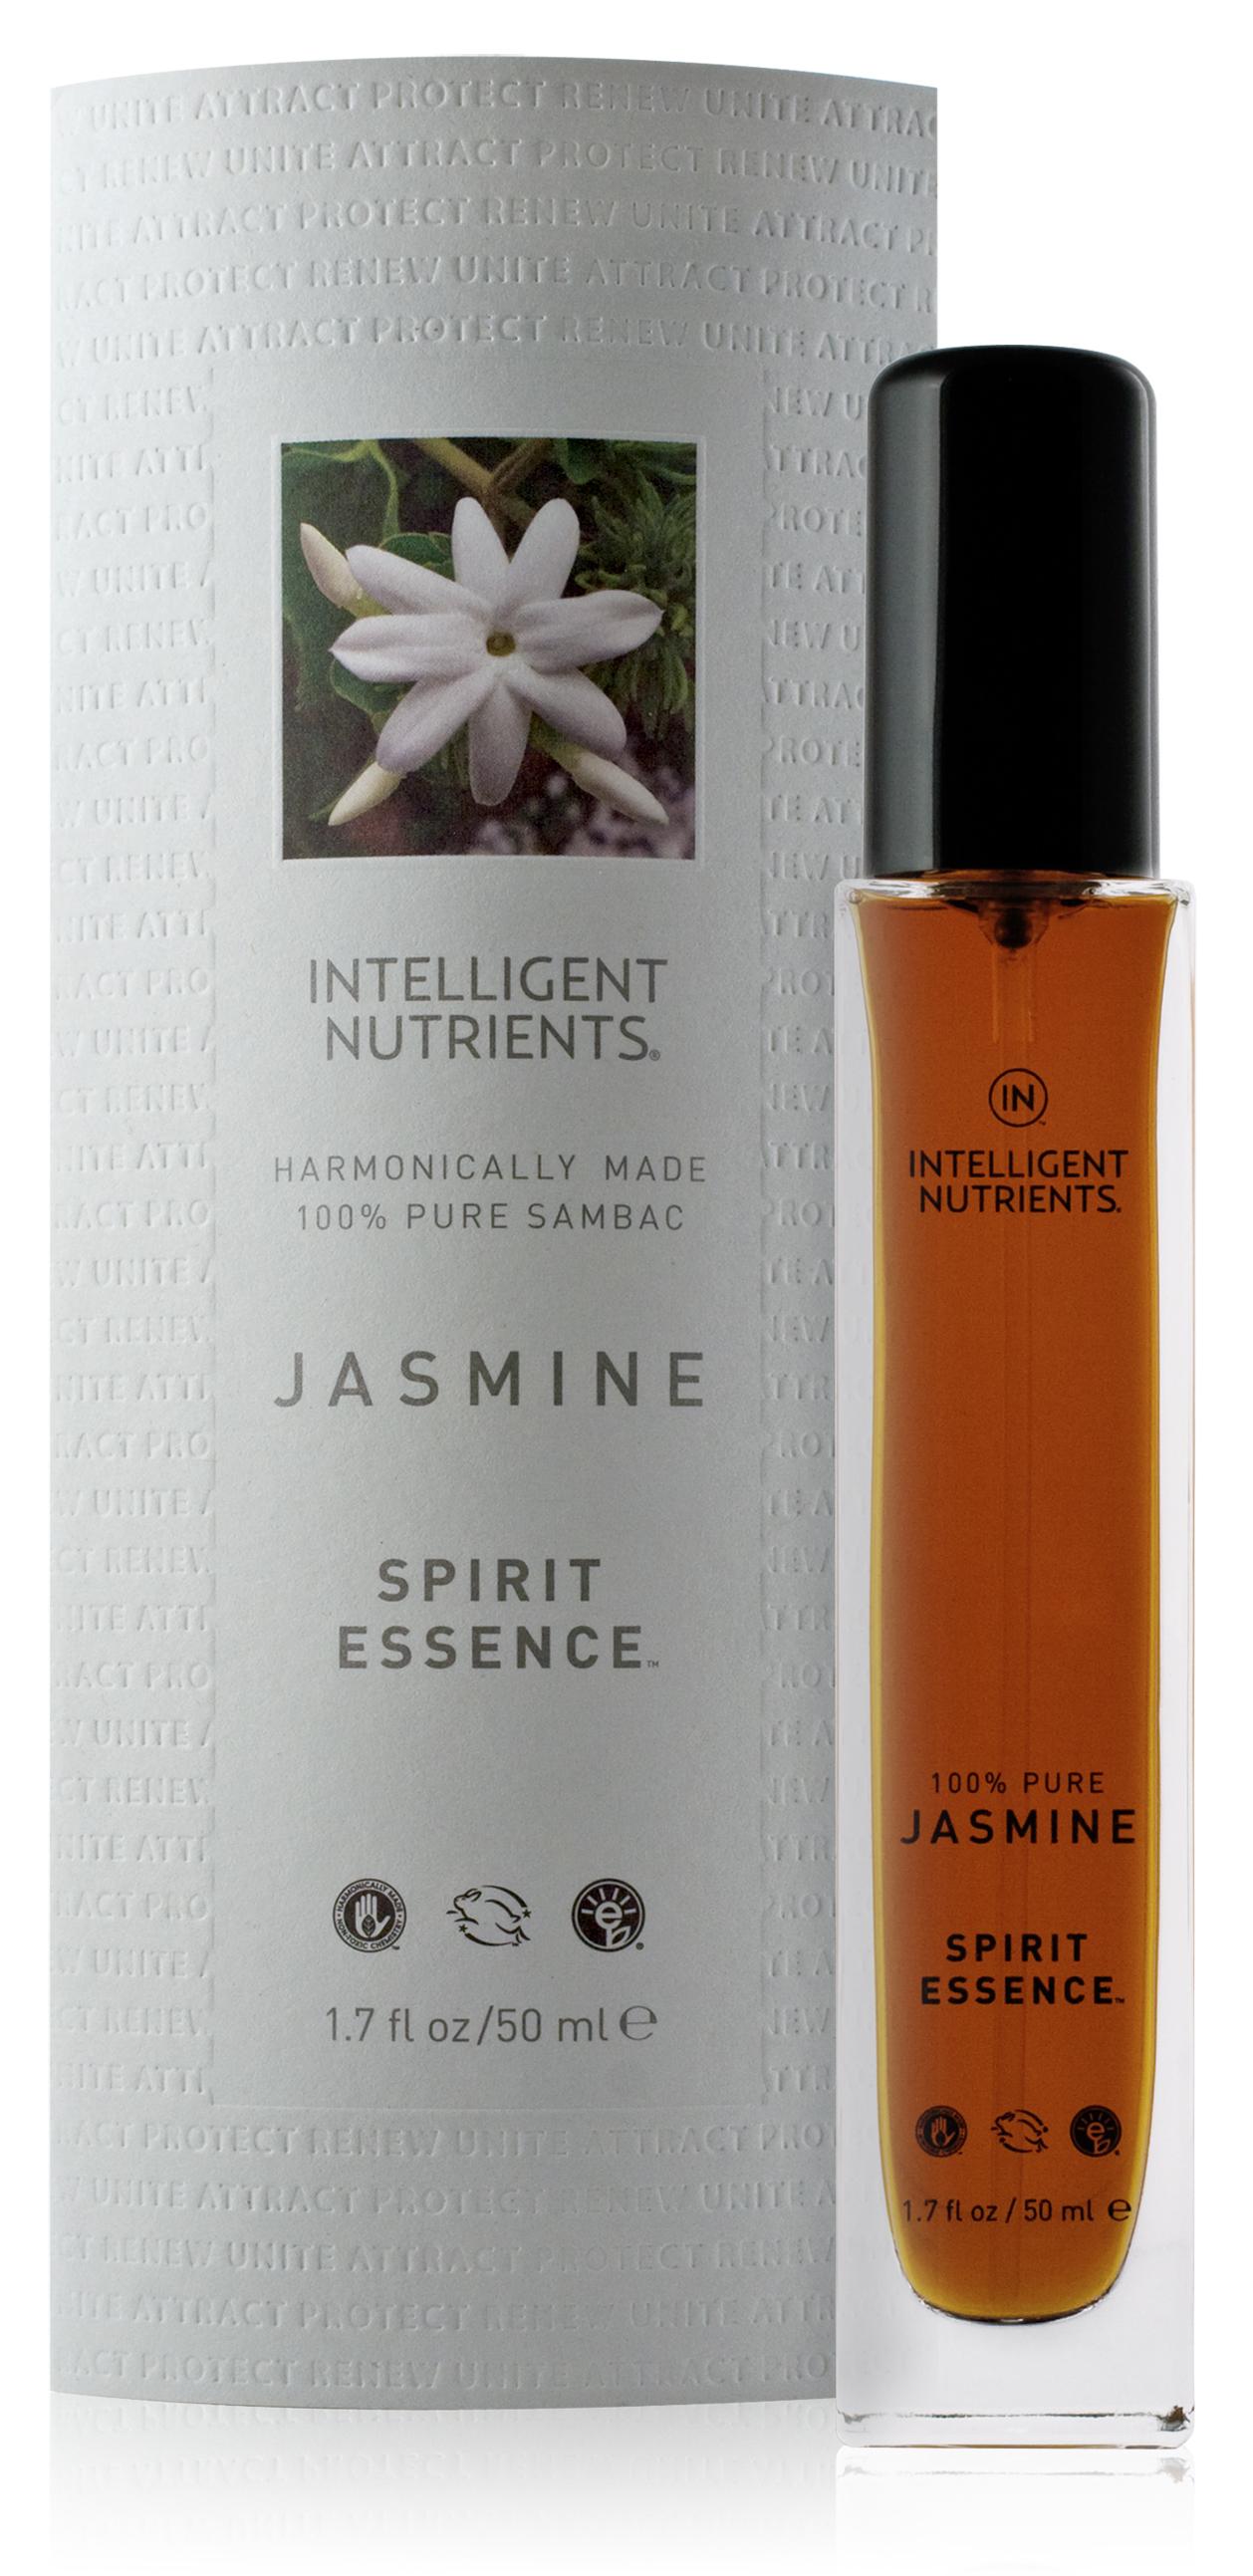 Jasmine Spirit Essence (DKK755/50ml)